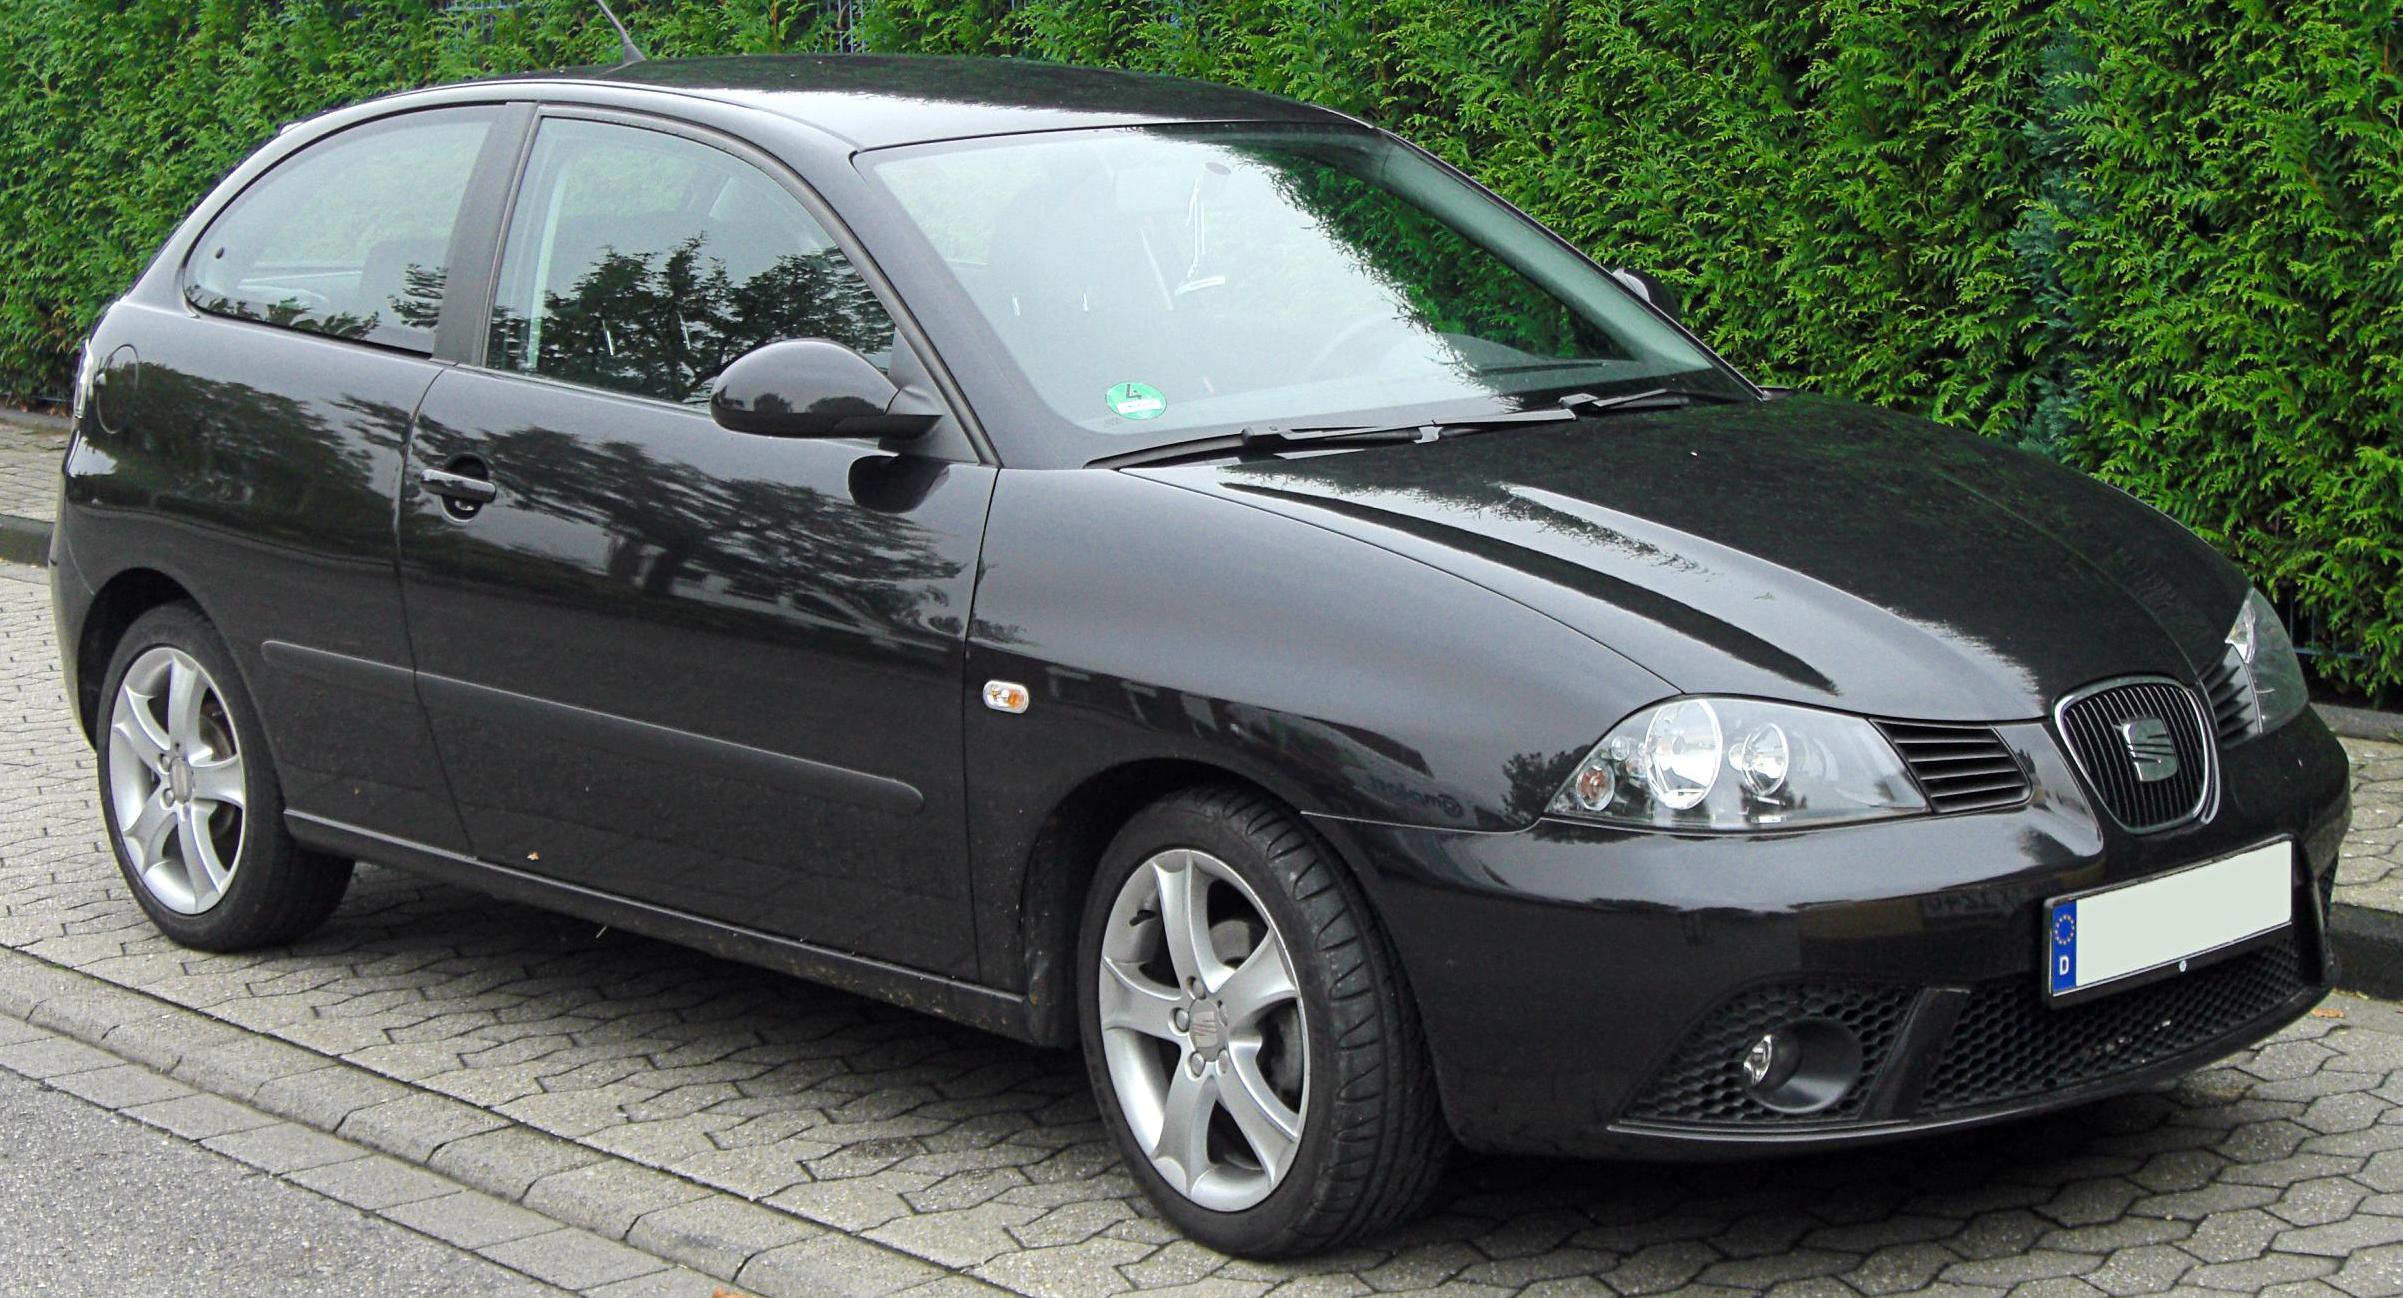 Seat Ibiza Mk3 Stereo Seat Ibiza Mk3 Facelift